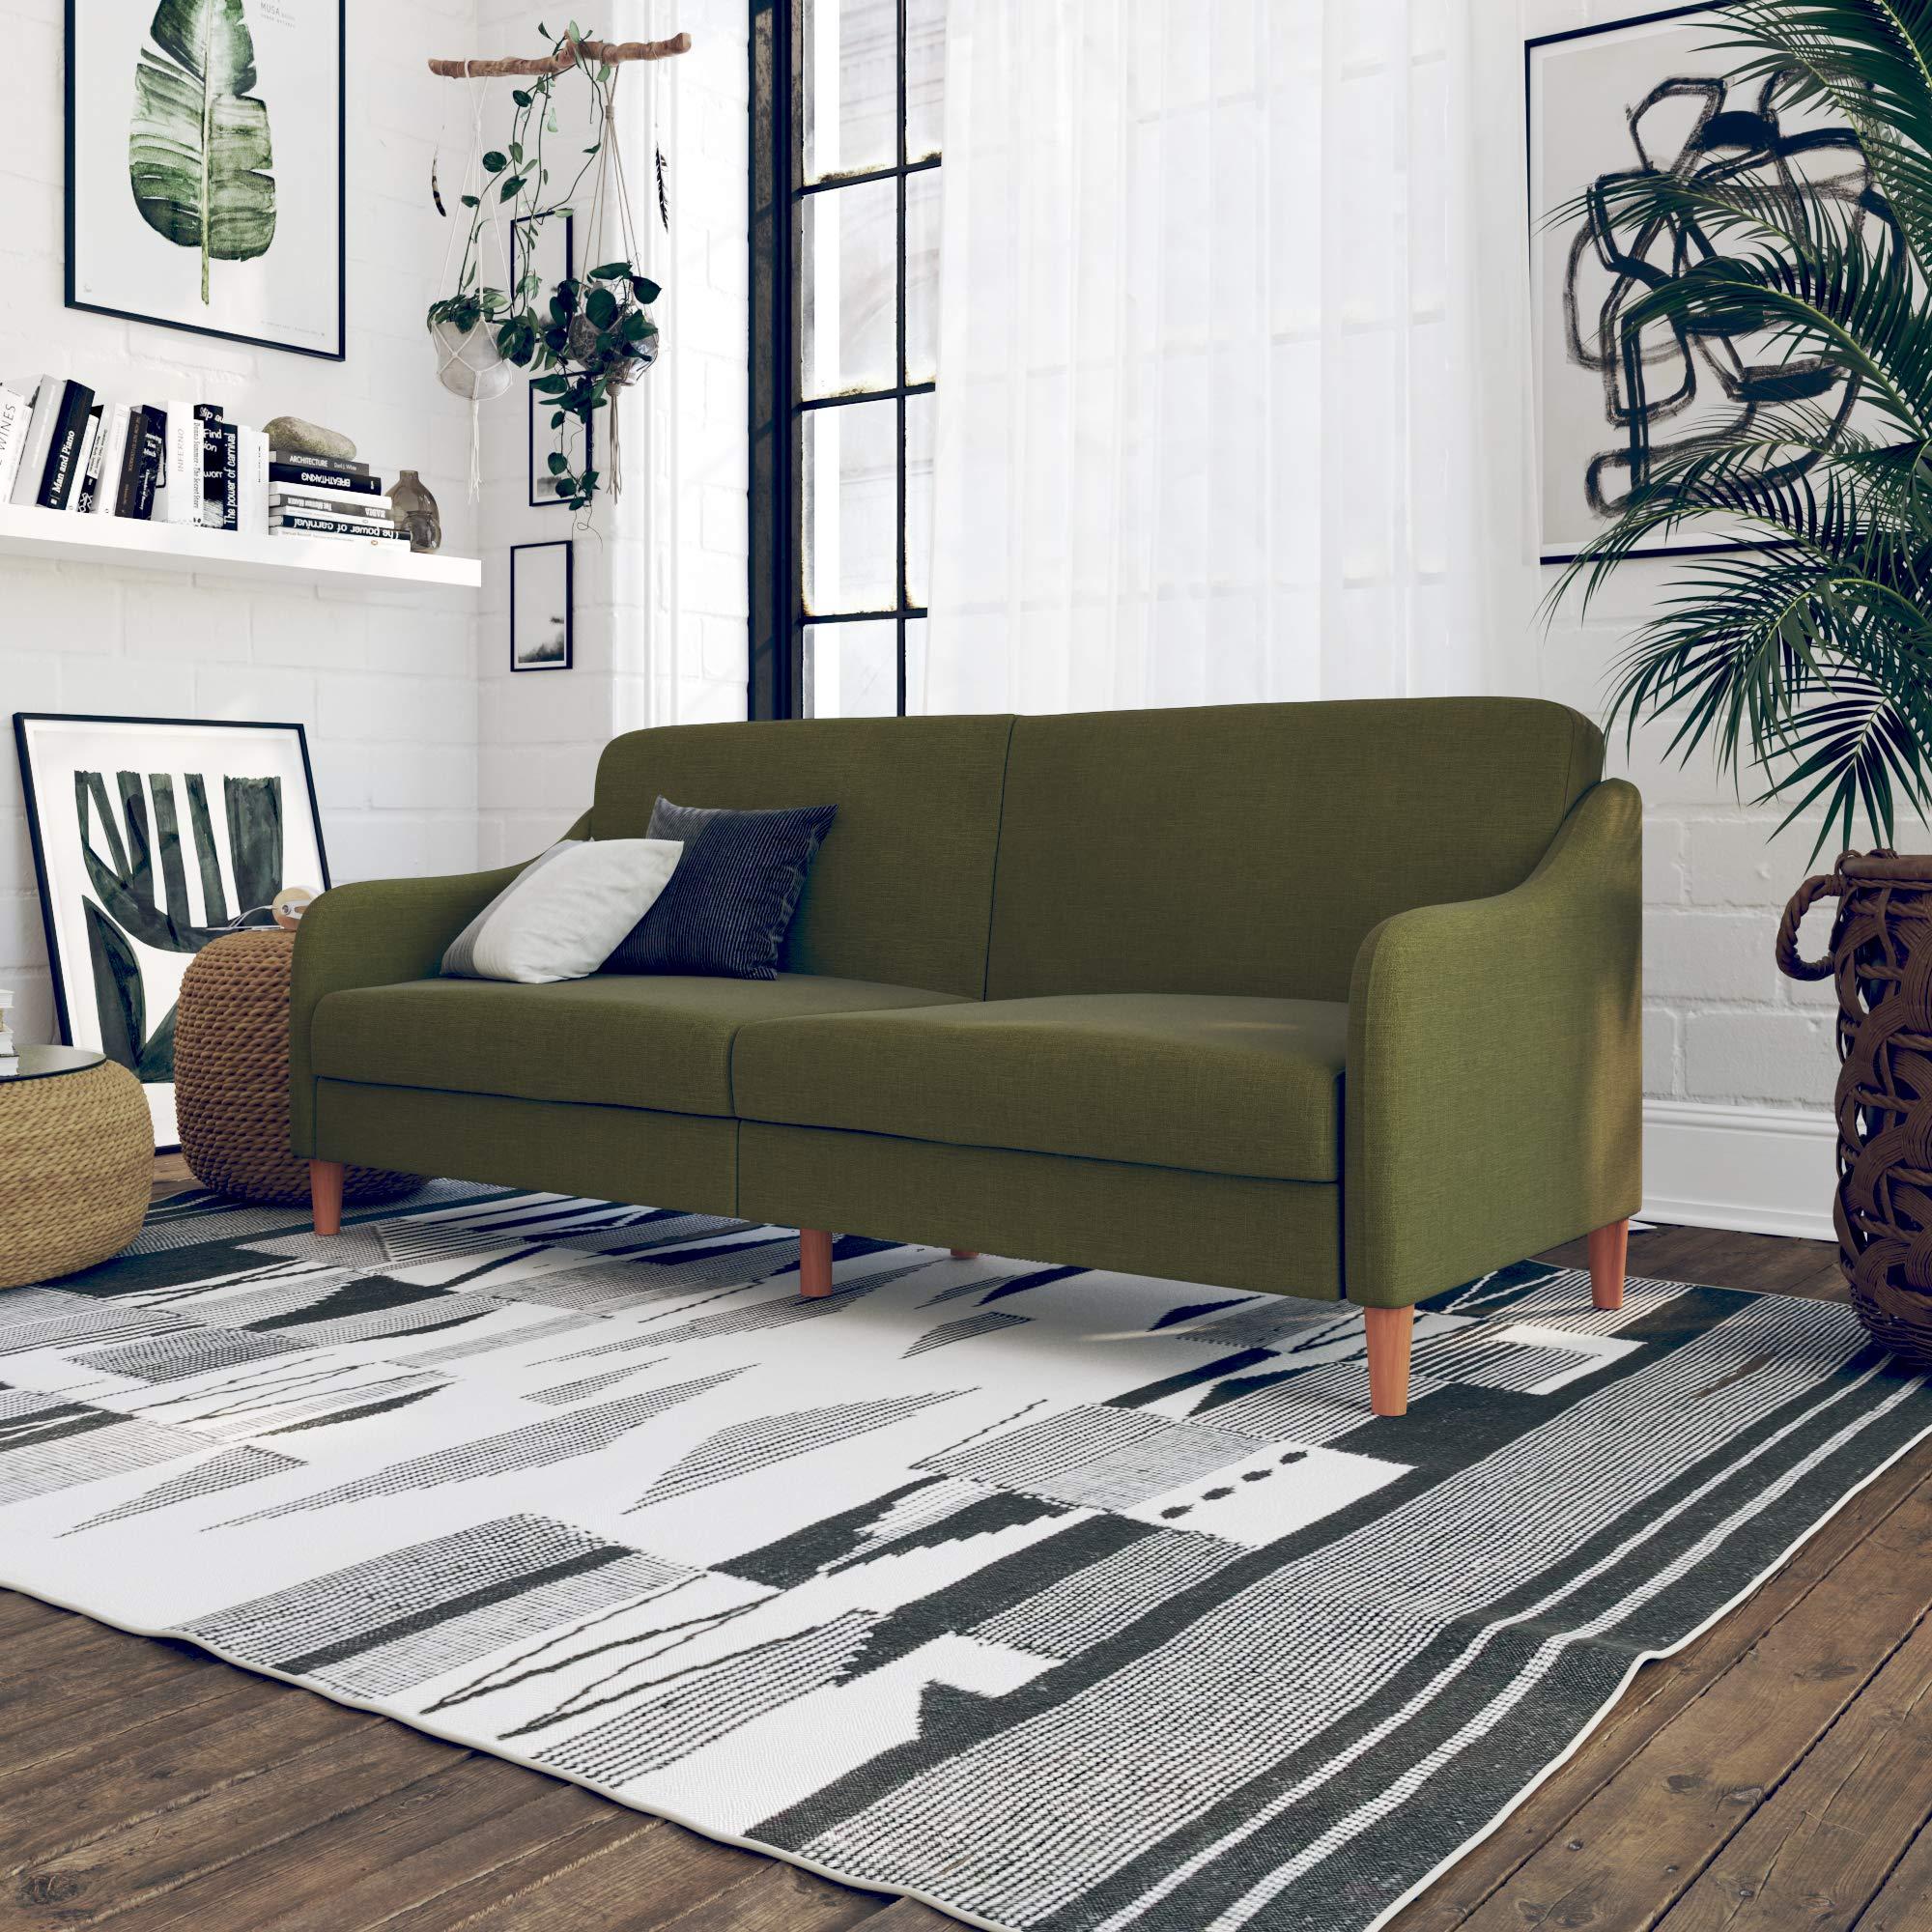 DHP Jasper Coil Futon, Green Linen by DHP